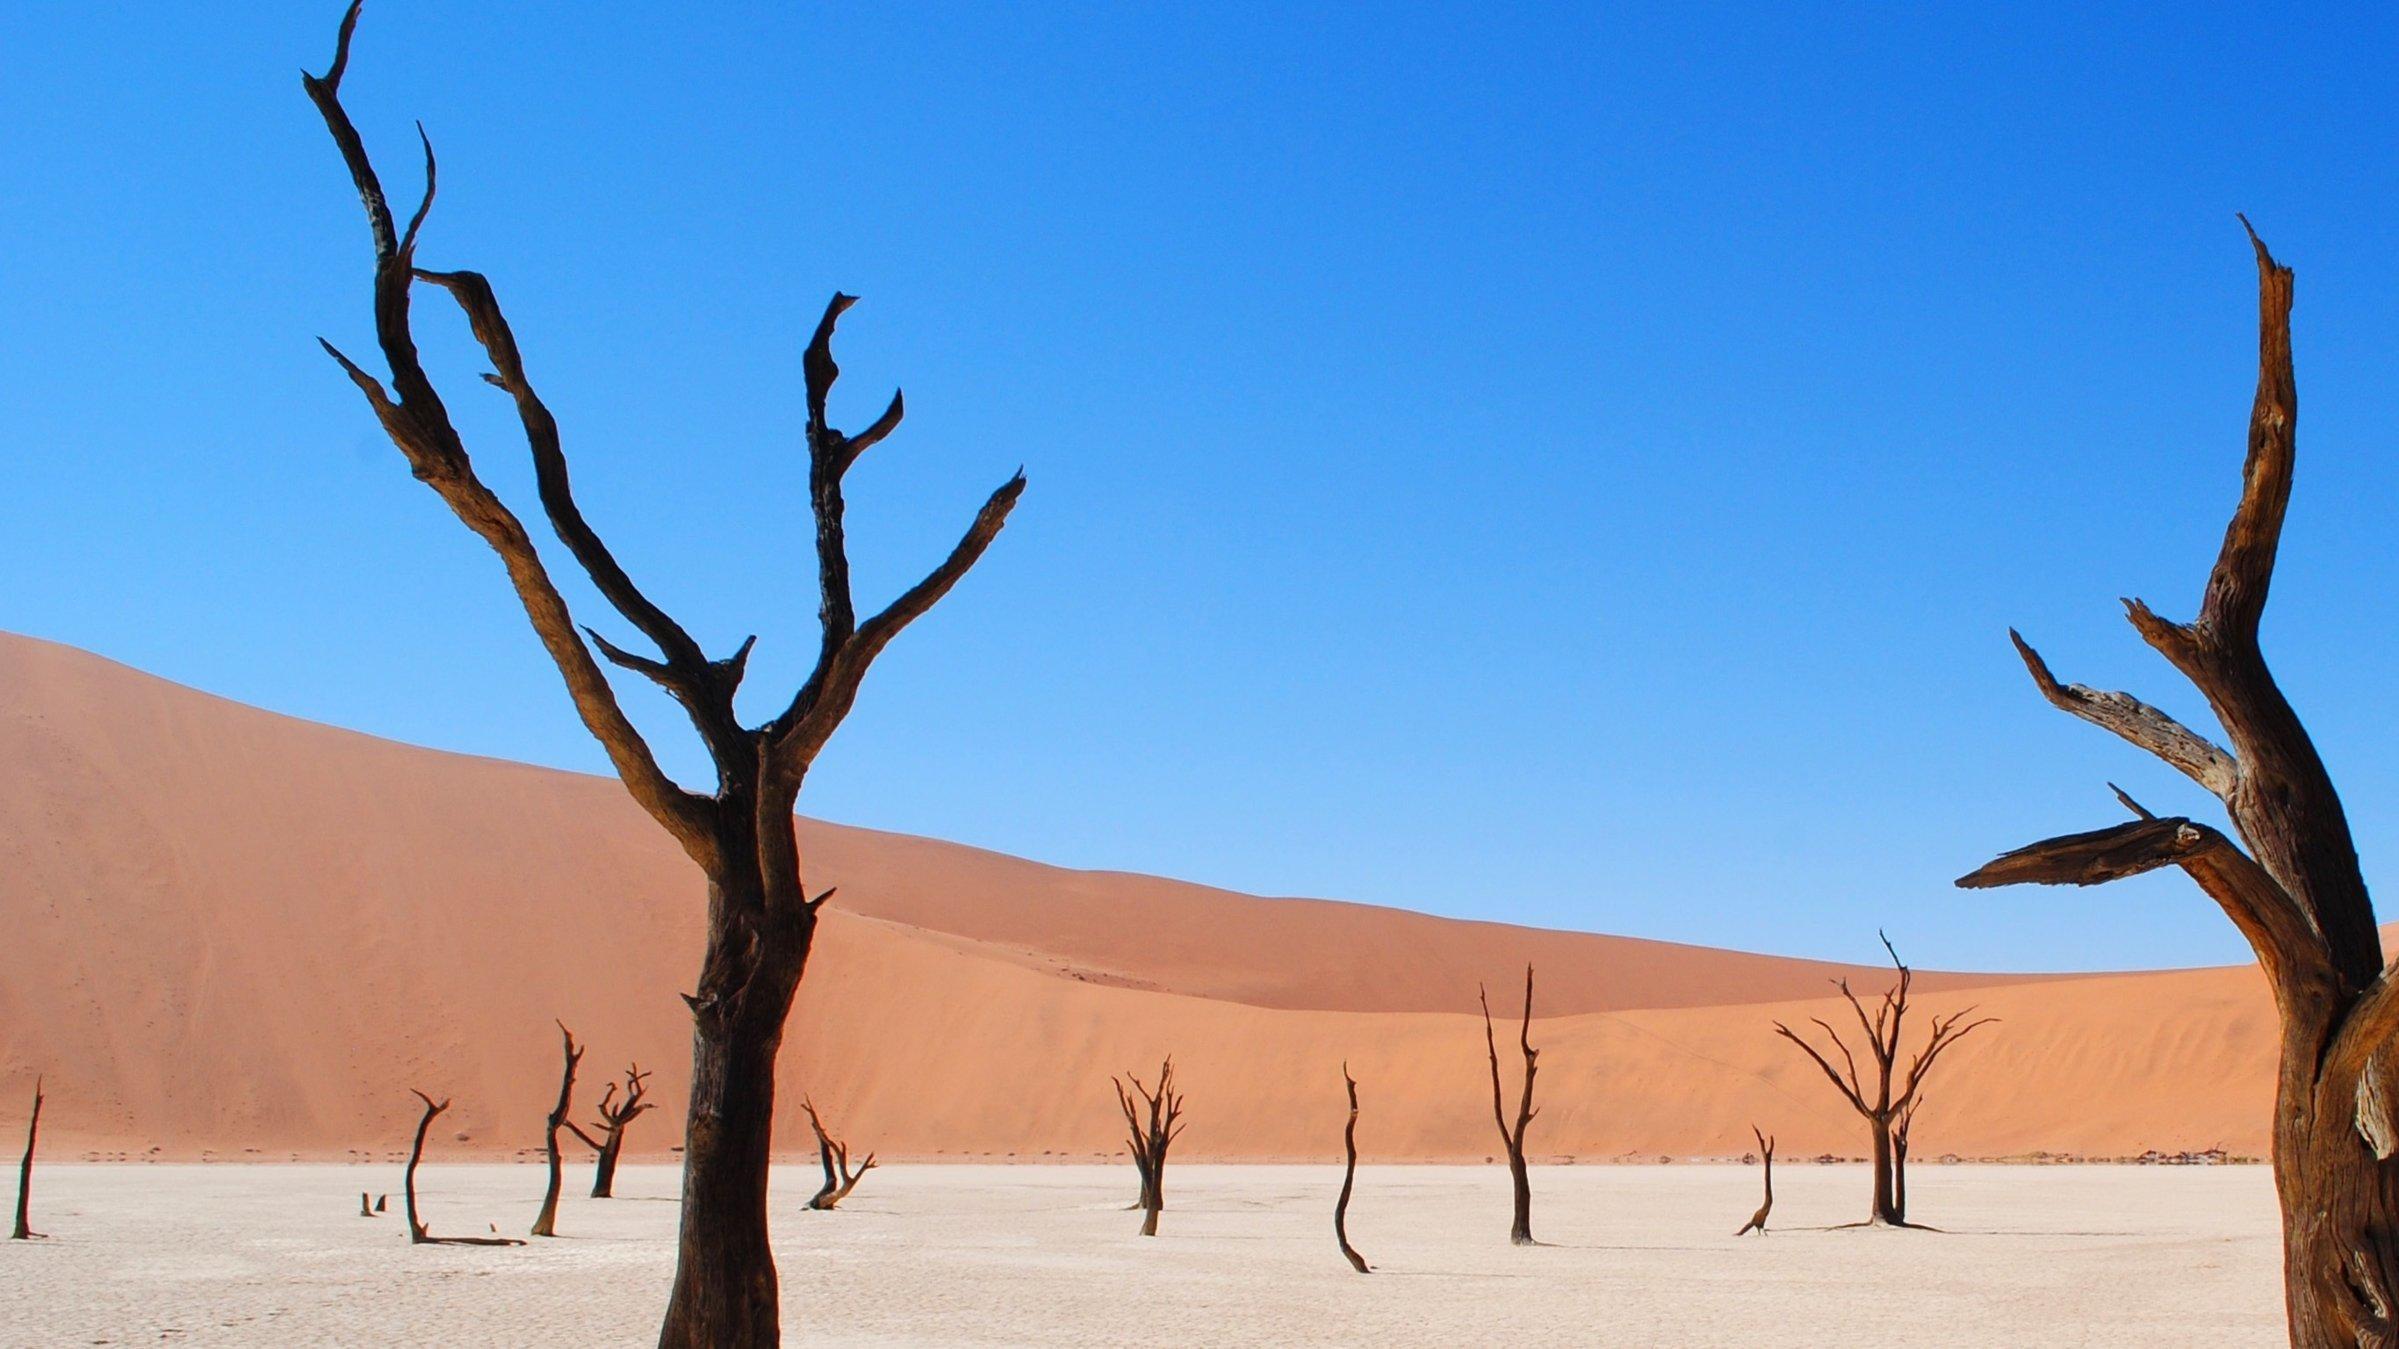 3-Day Namib Desert Camping - Namibia Itinerary